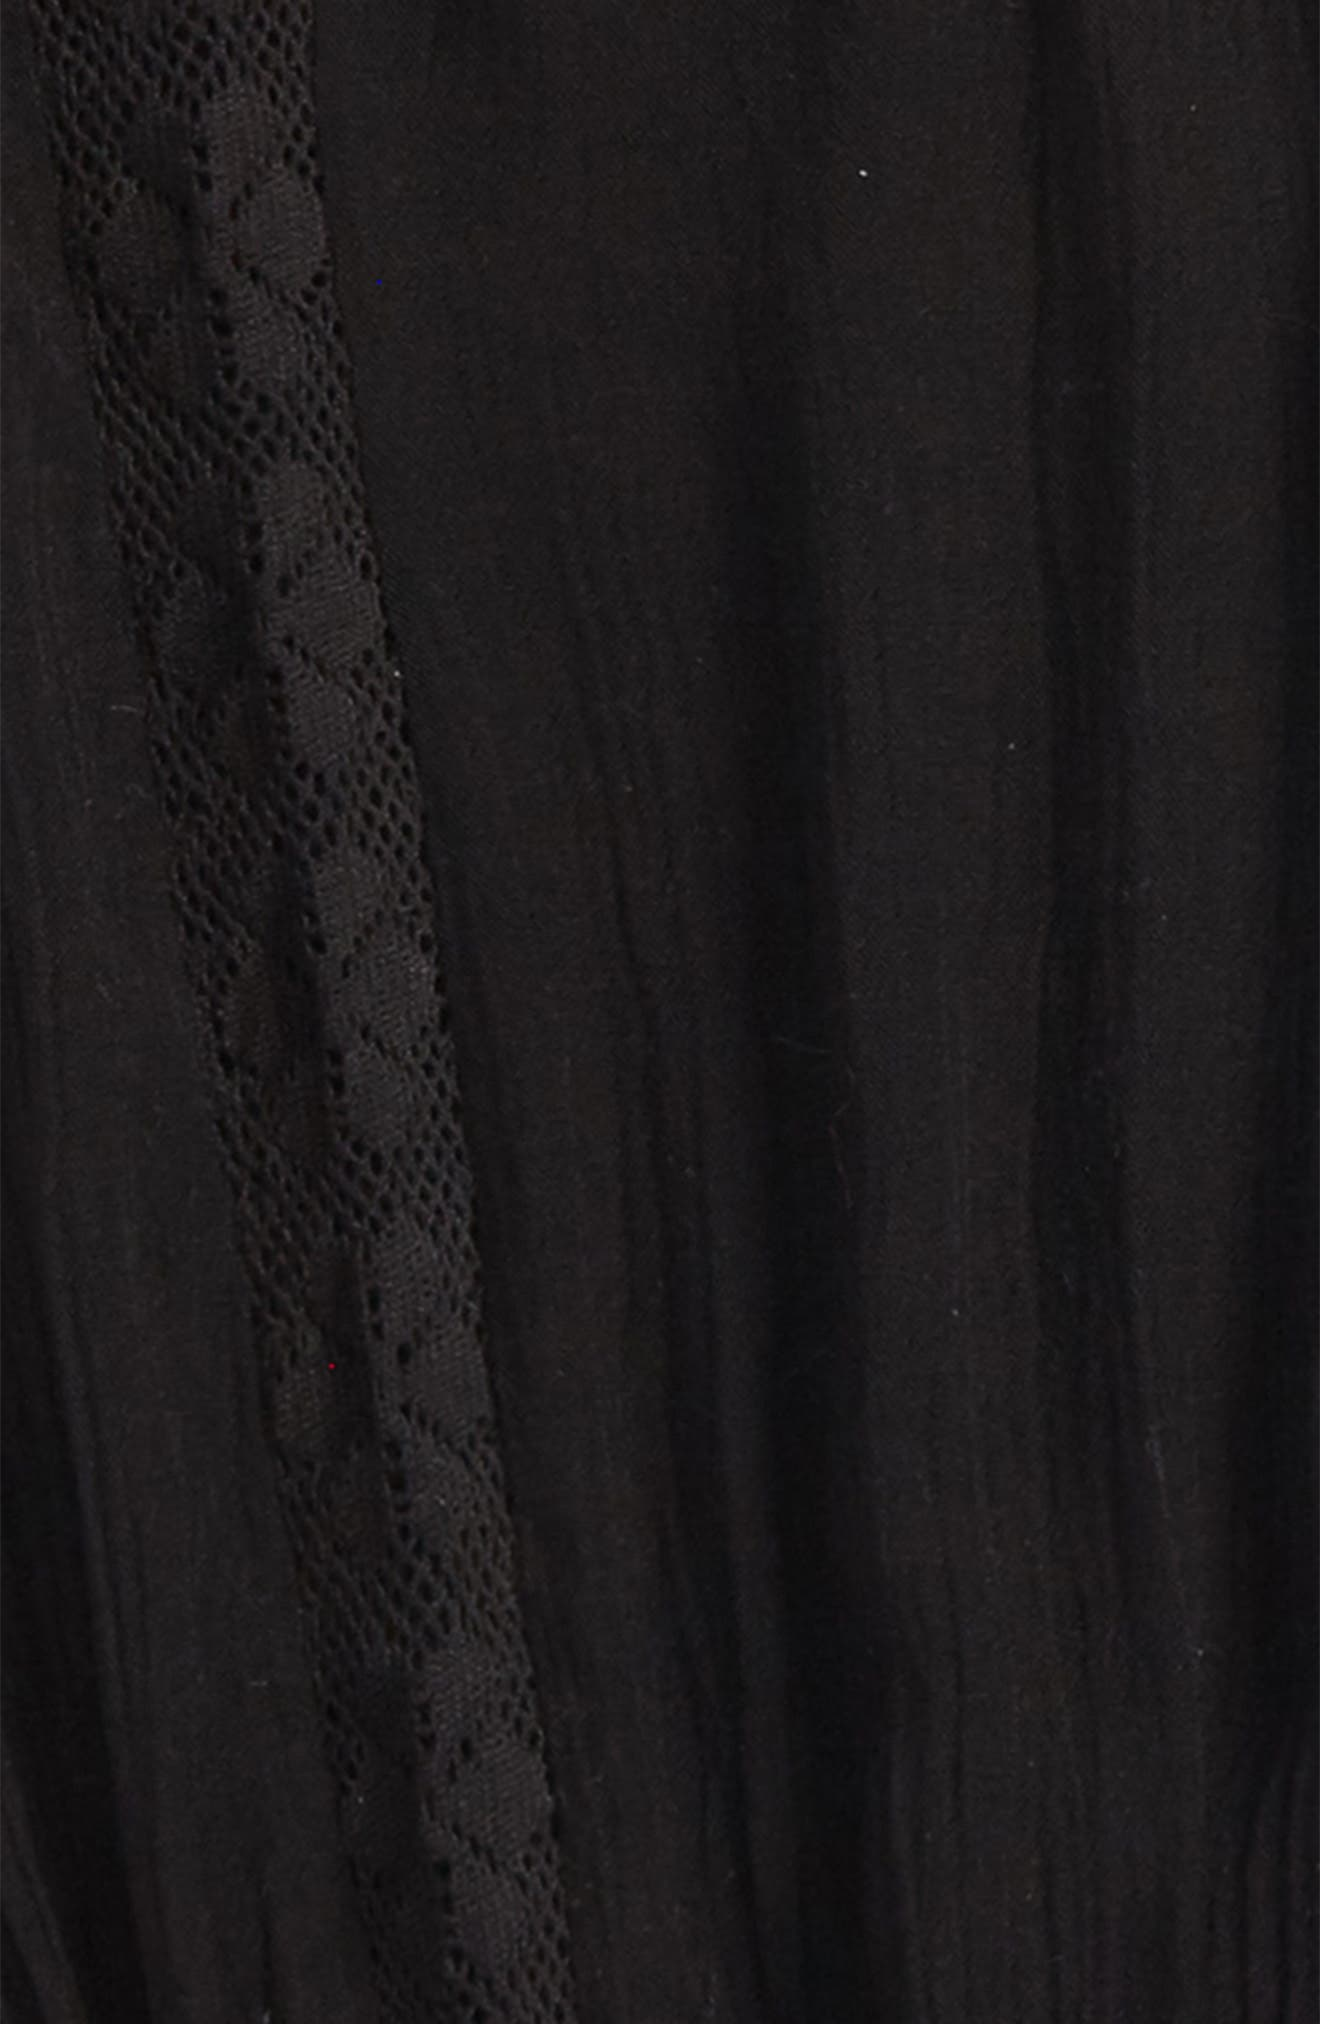 O'NEILL,                             Woven Long Sleeve Top,                             Alternate thumbnail 2, color,                             001